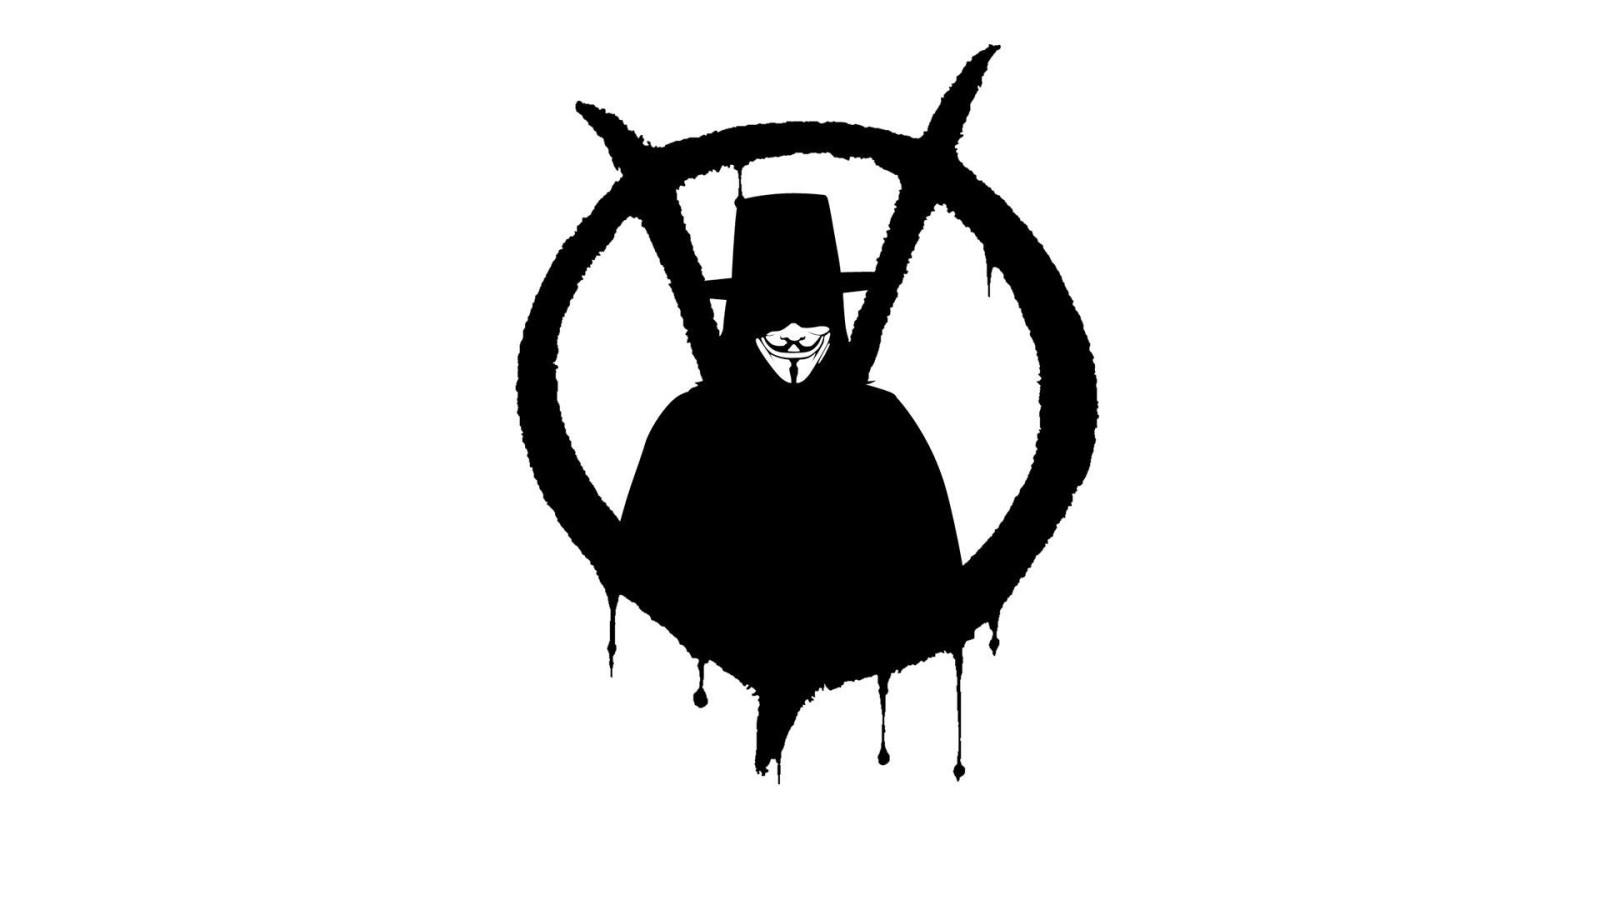 V For Vendetta Logo Hd Desktop Wallpaper Widescreen